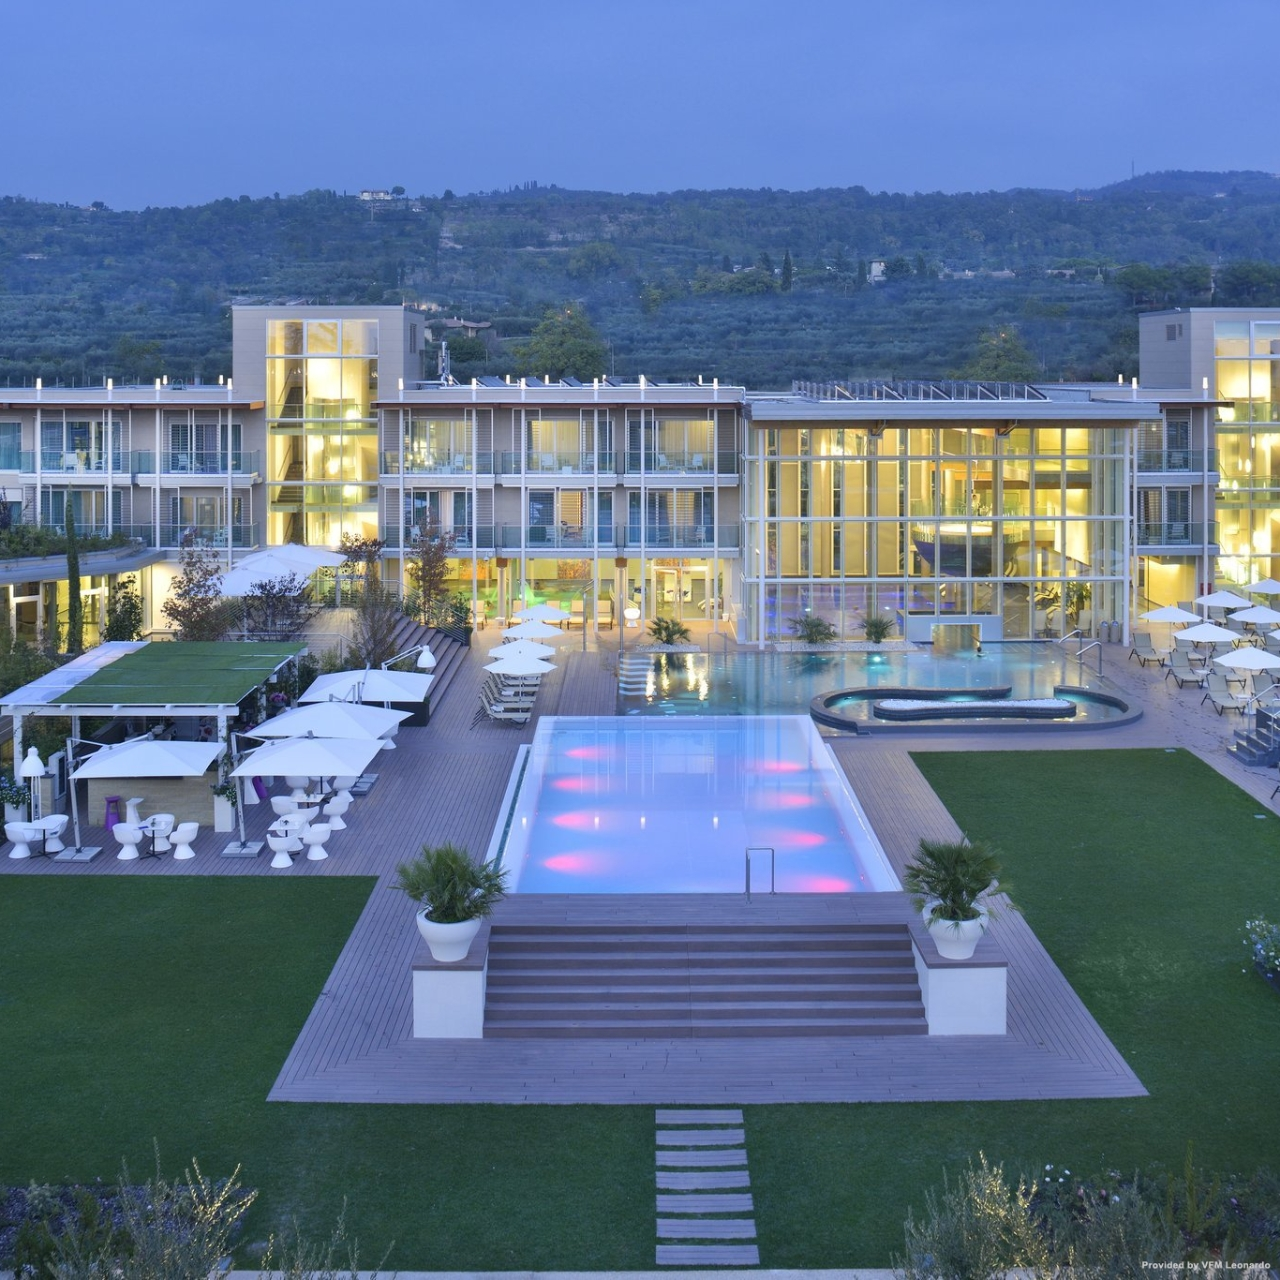 Corte San Luca Bardolino aqualux hotel spa suite&terme - 4 hrs star hotel in